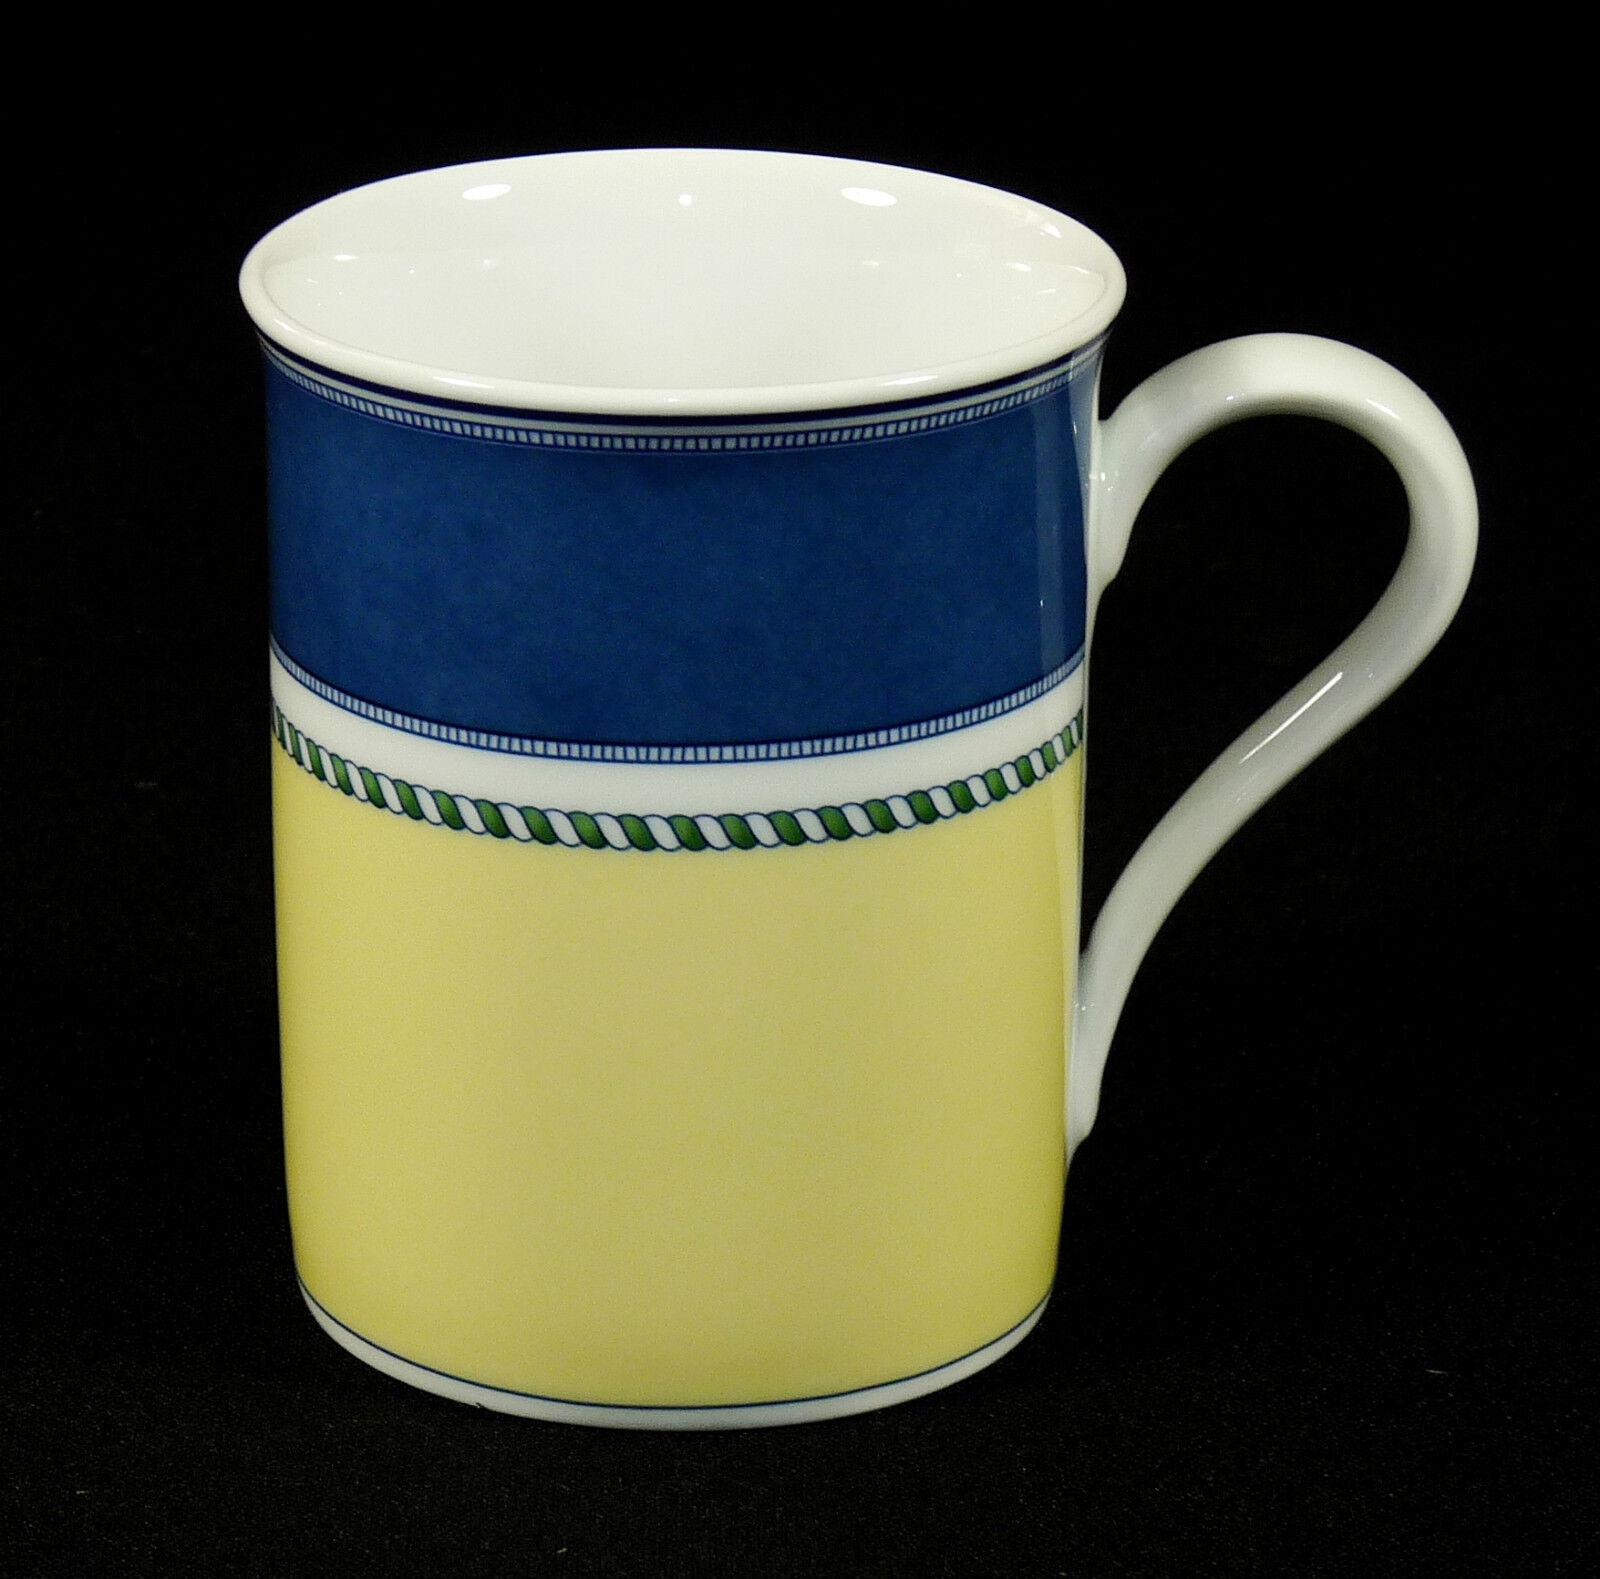 HUTSCHENREUTHER - Pott KAFFEEPOTT Kaffeetasse Tasse - MEDLEY - Mantova - wie neu     Kaufen